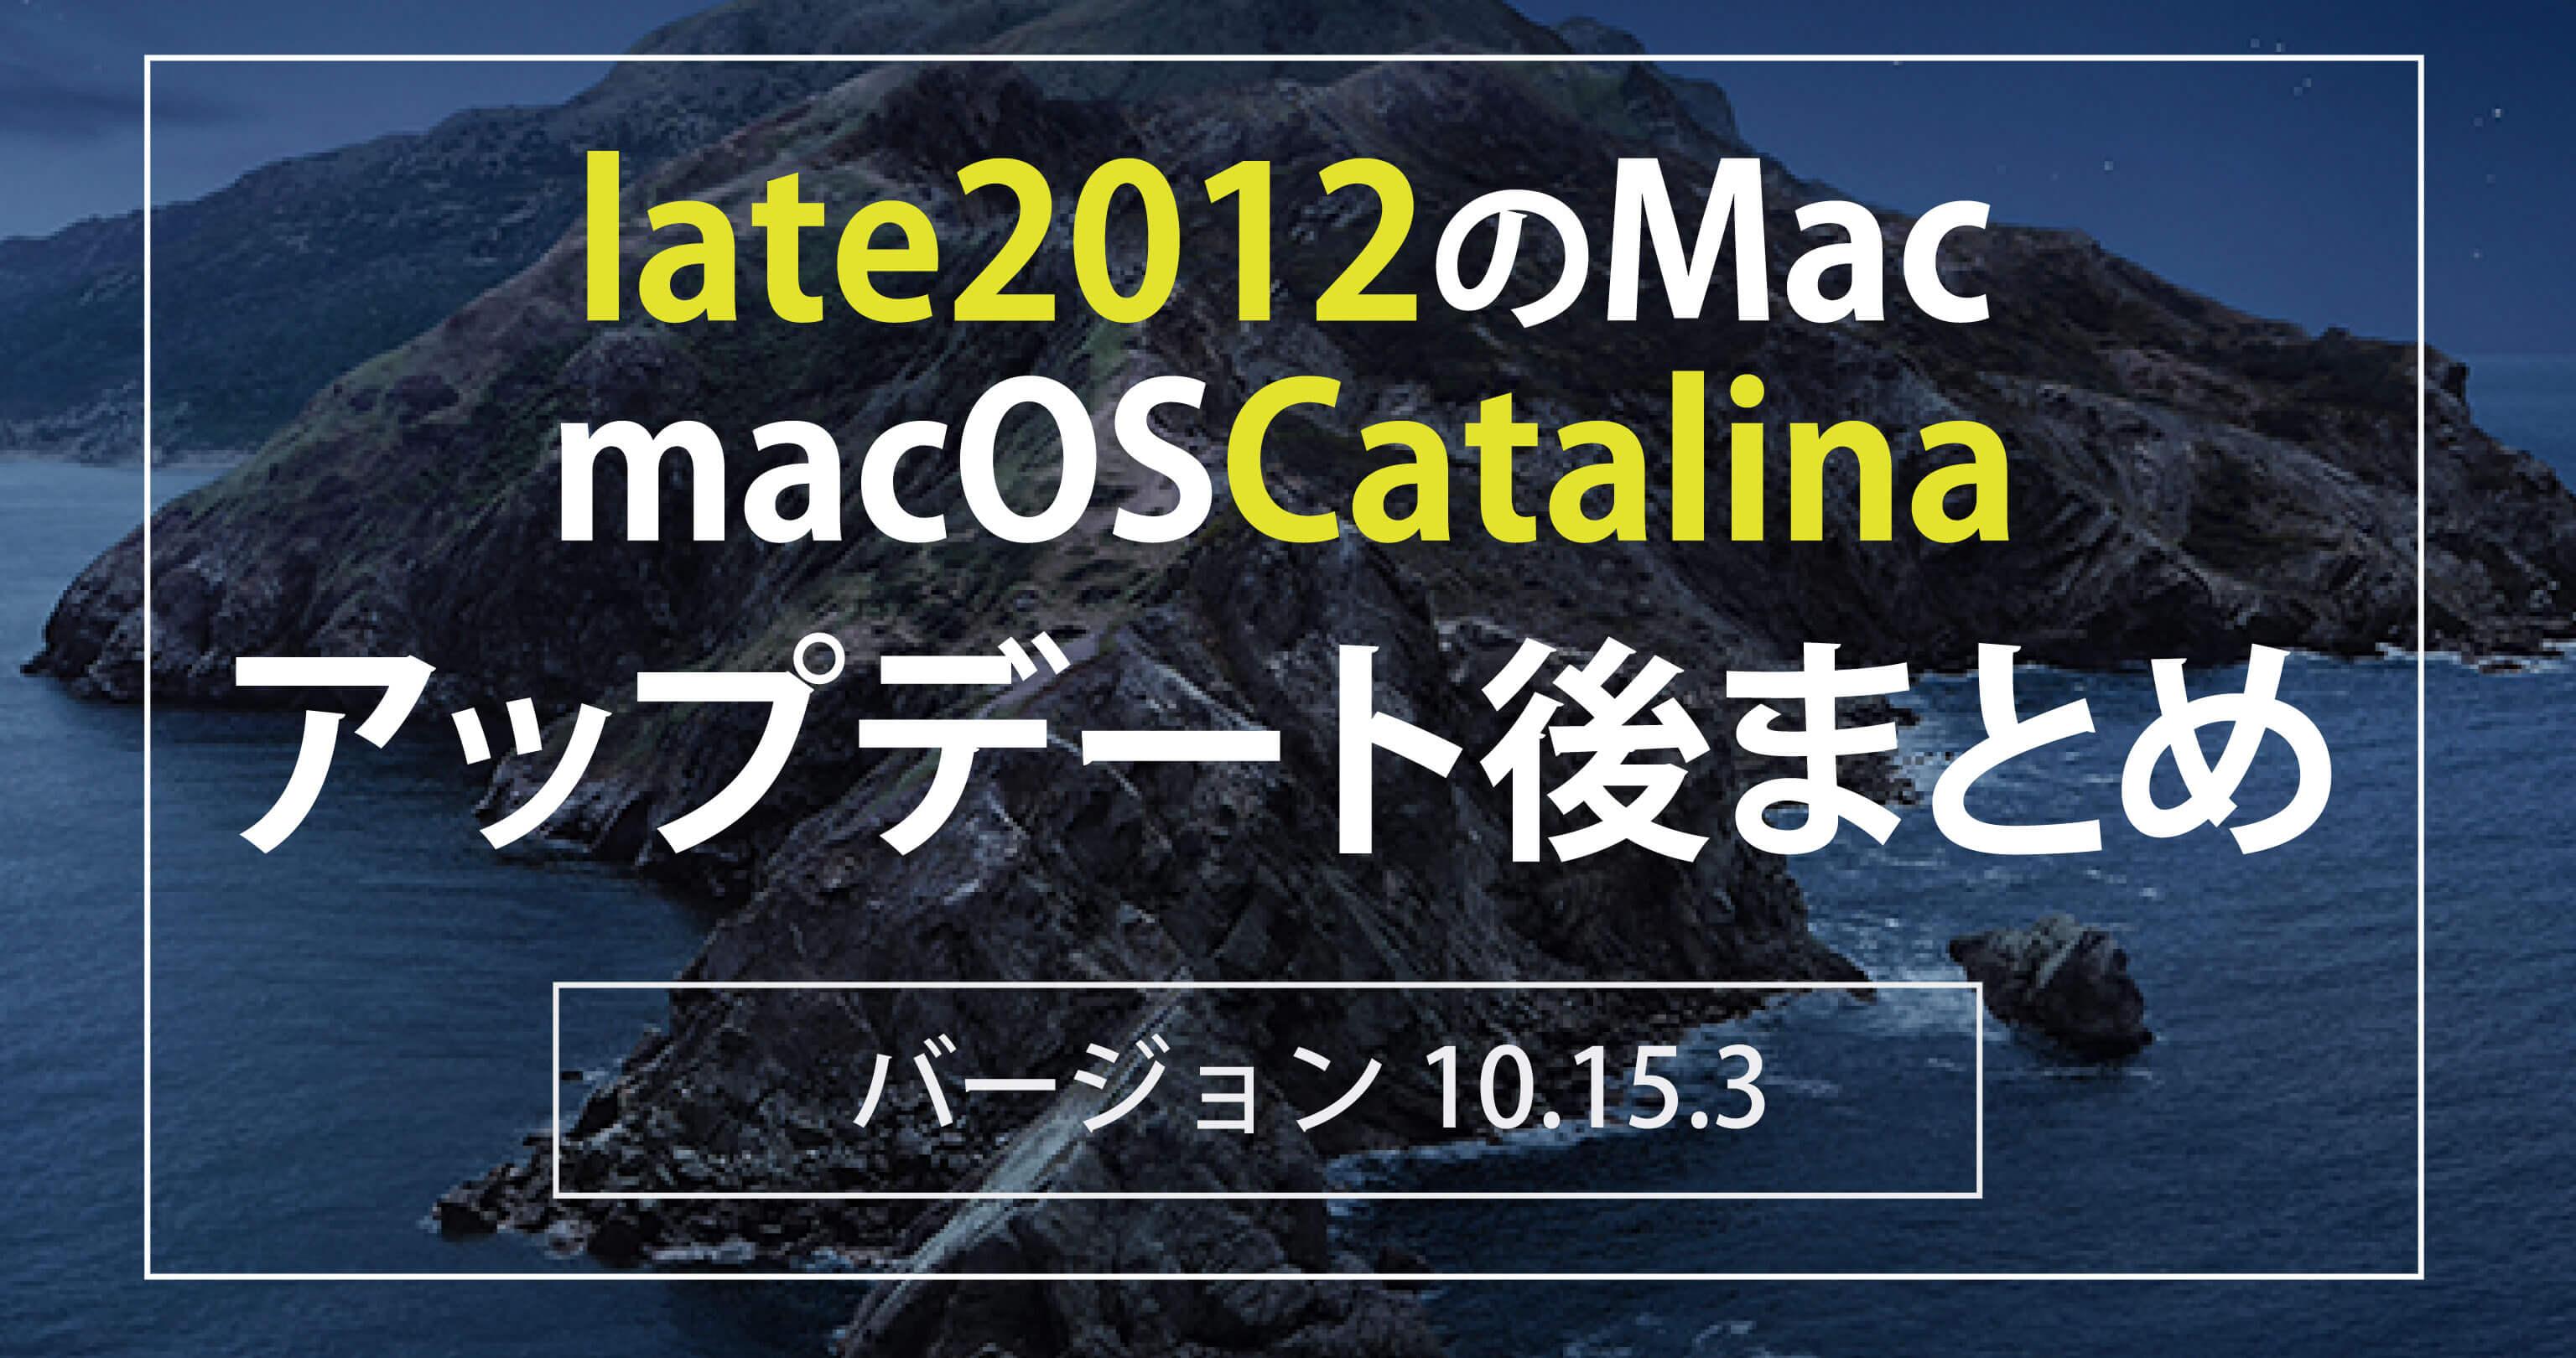 late2012のMac をmacOSCatalina10.15.3アップデート後まとめ(不具合の確認など)